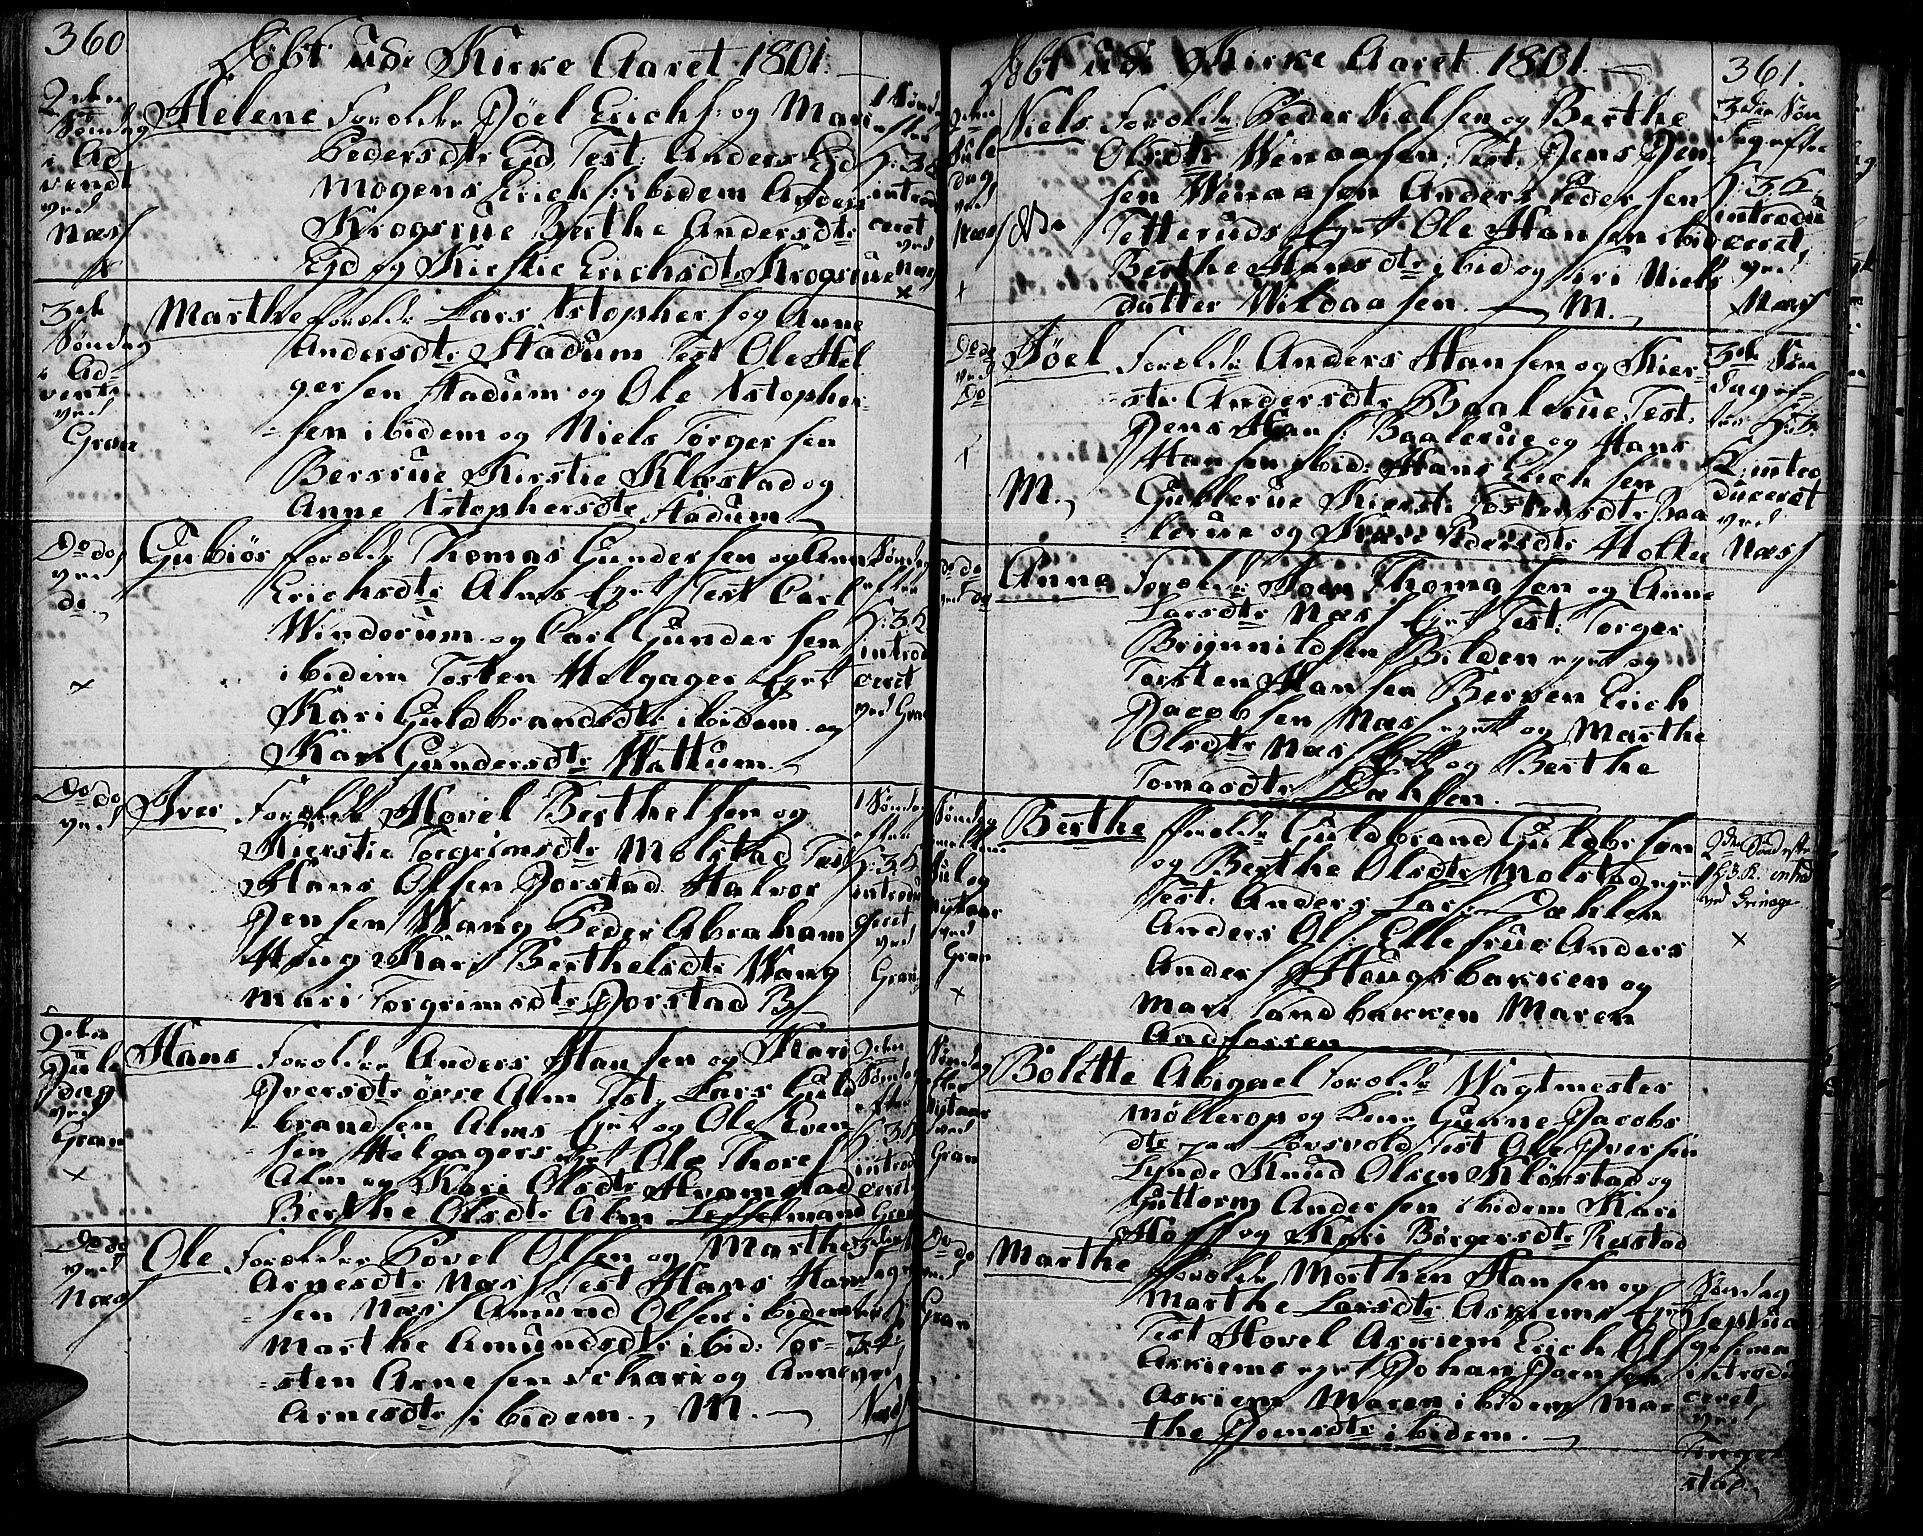 SAH, Gran prestekontor, Ministerialbok nr. 6, 1787-1824, s. 360-361